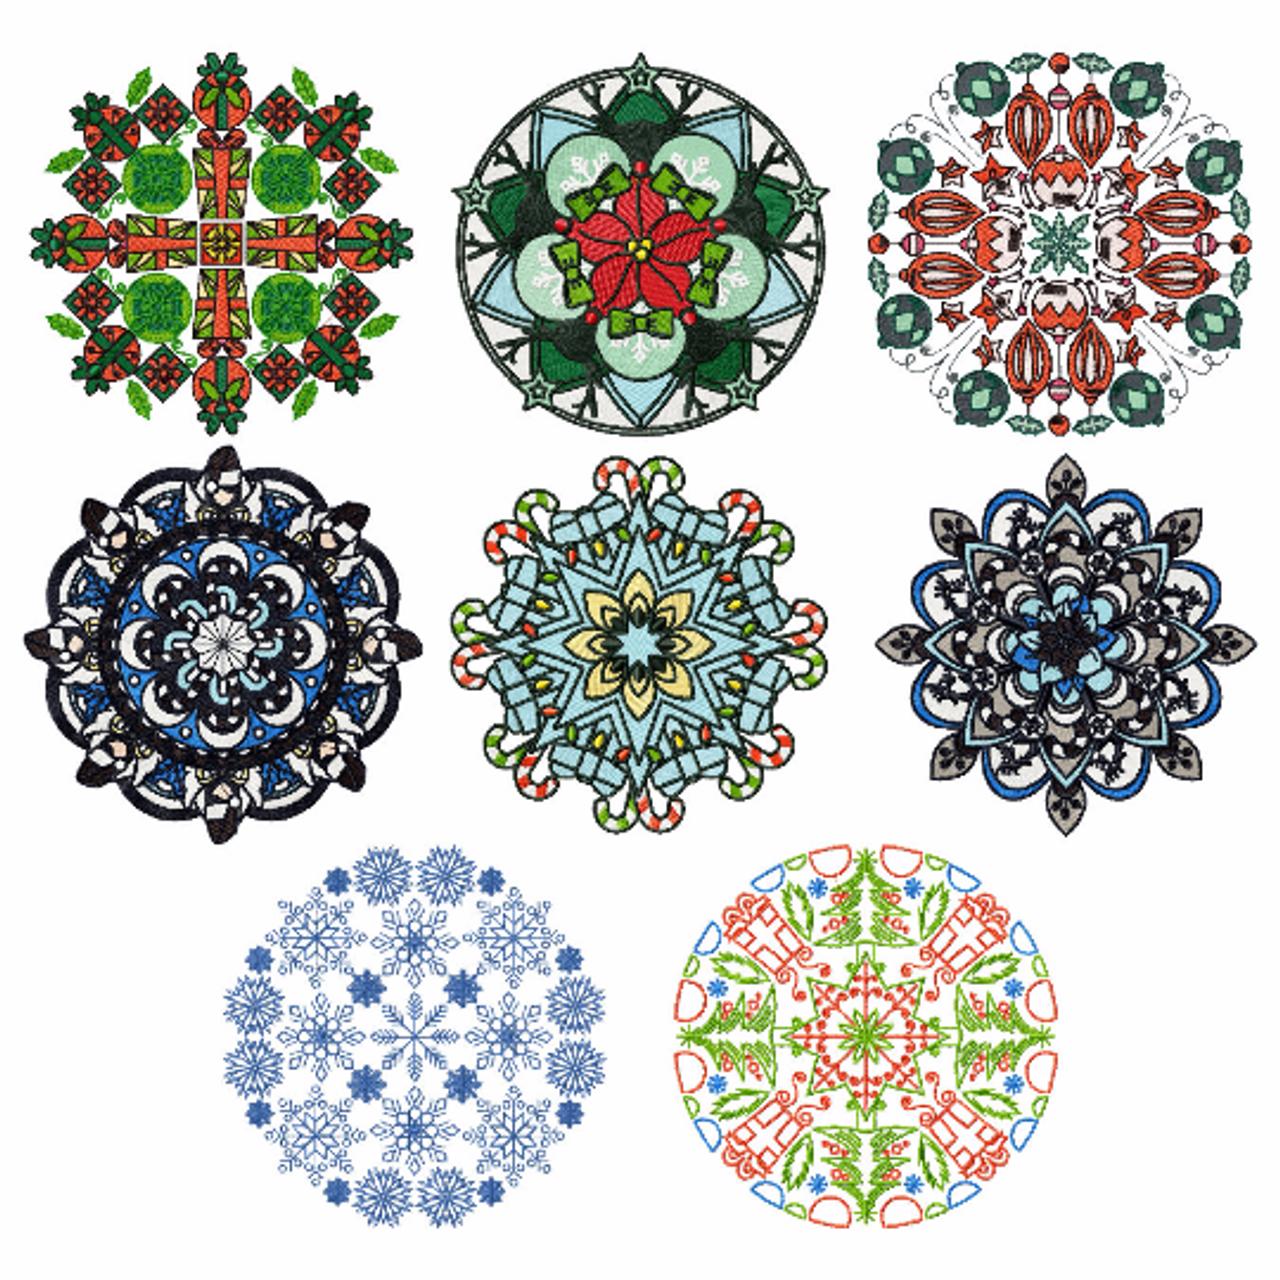 Machine Embroidery Designs - Christmas Mandalas of 8